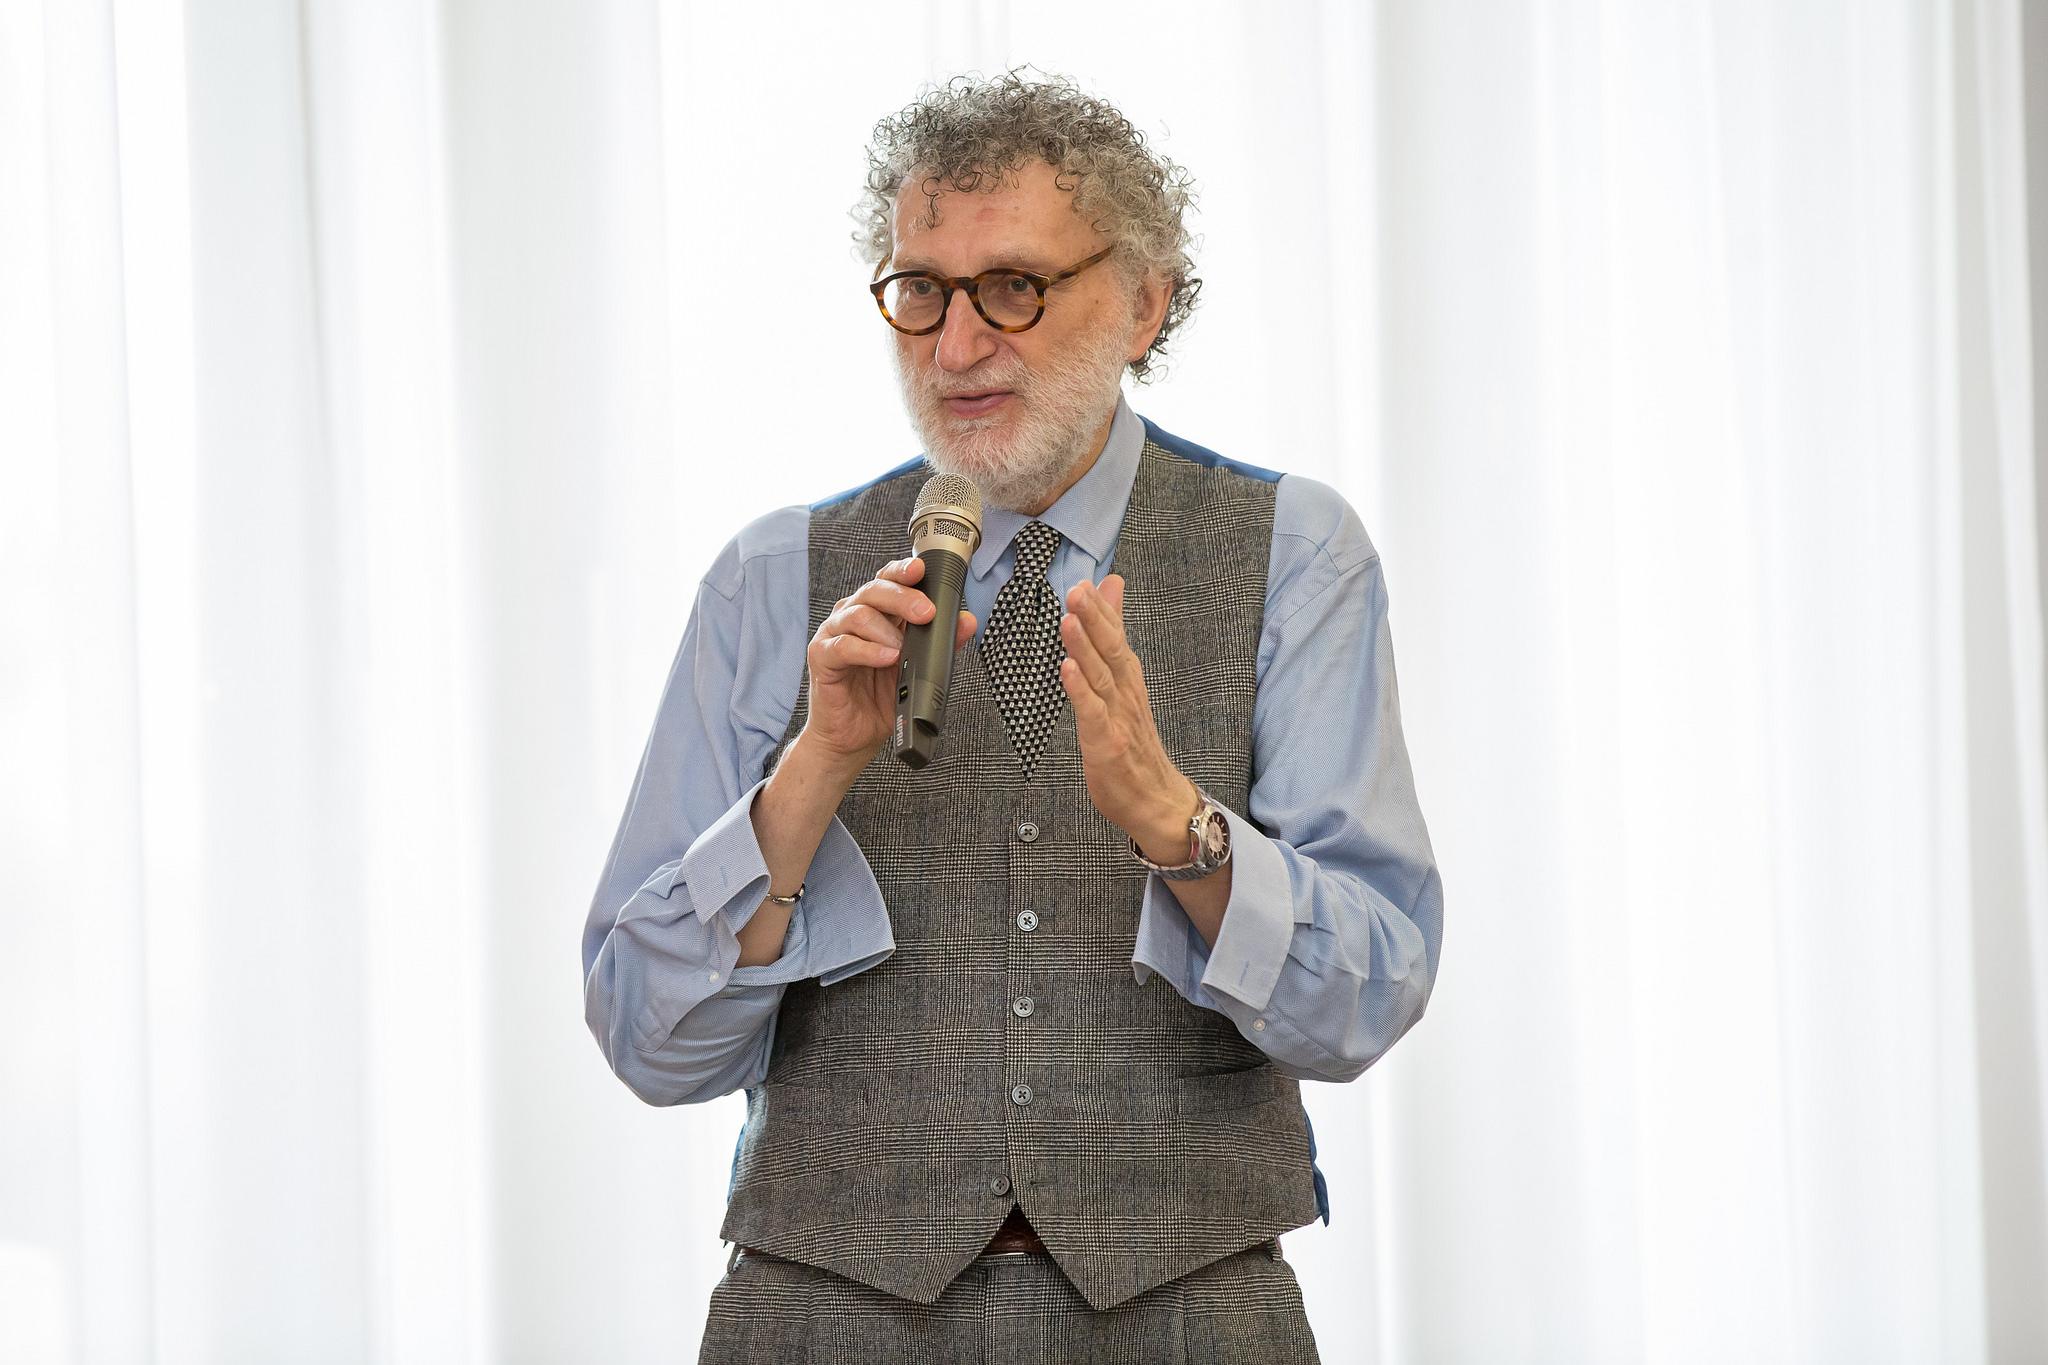 Jean-Michel Glachant